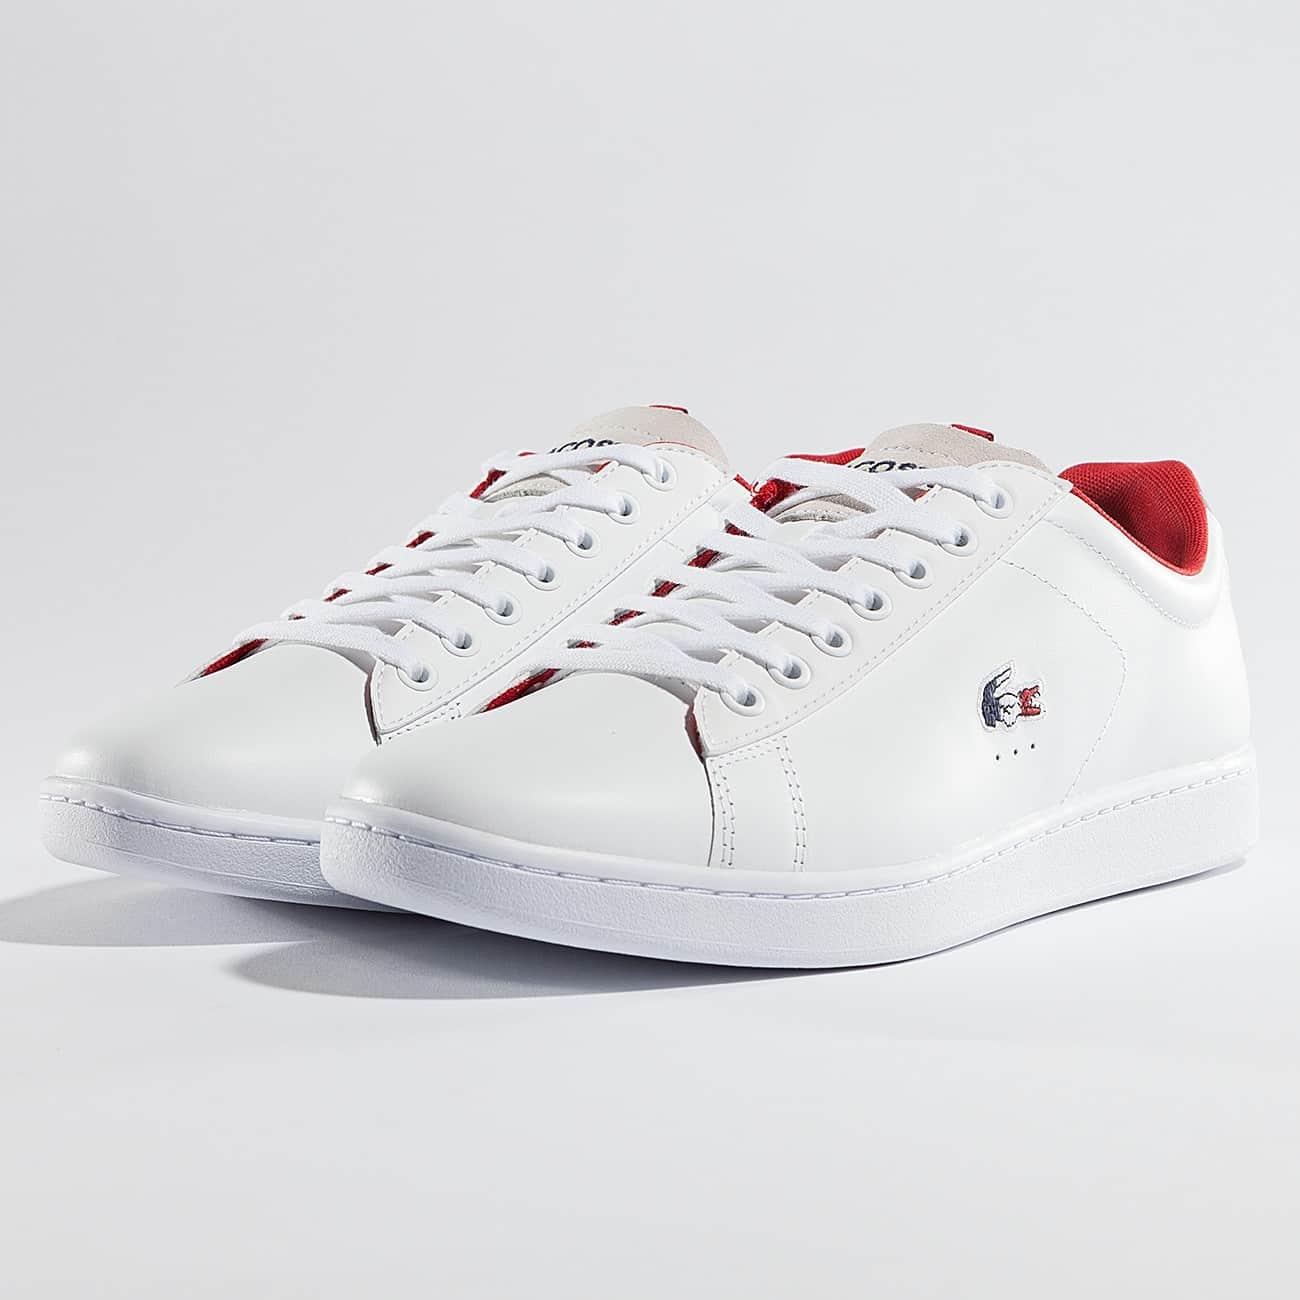 ae8525b86a22 Sneakers Carnaby Evo homme en cuir et suède ... Chaussures Lacoste Giron PRI  SPM Homme Blanc/Rouge Lacoste Chaussures / Baskets Marice BL 2 en blanc  femme ...